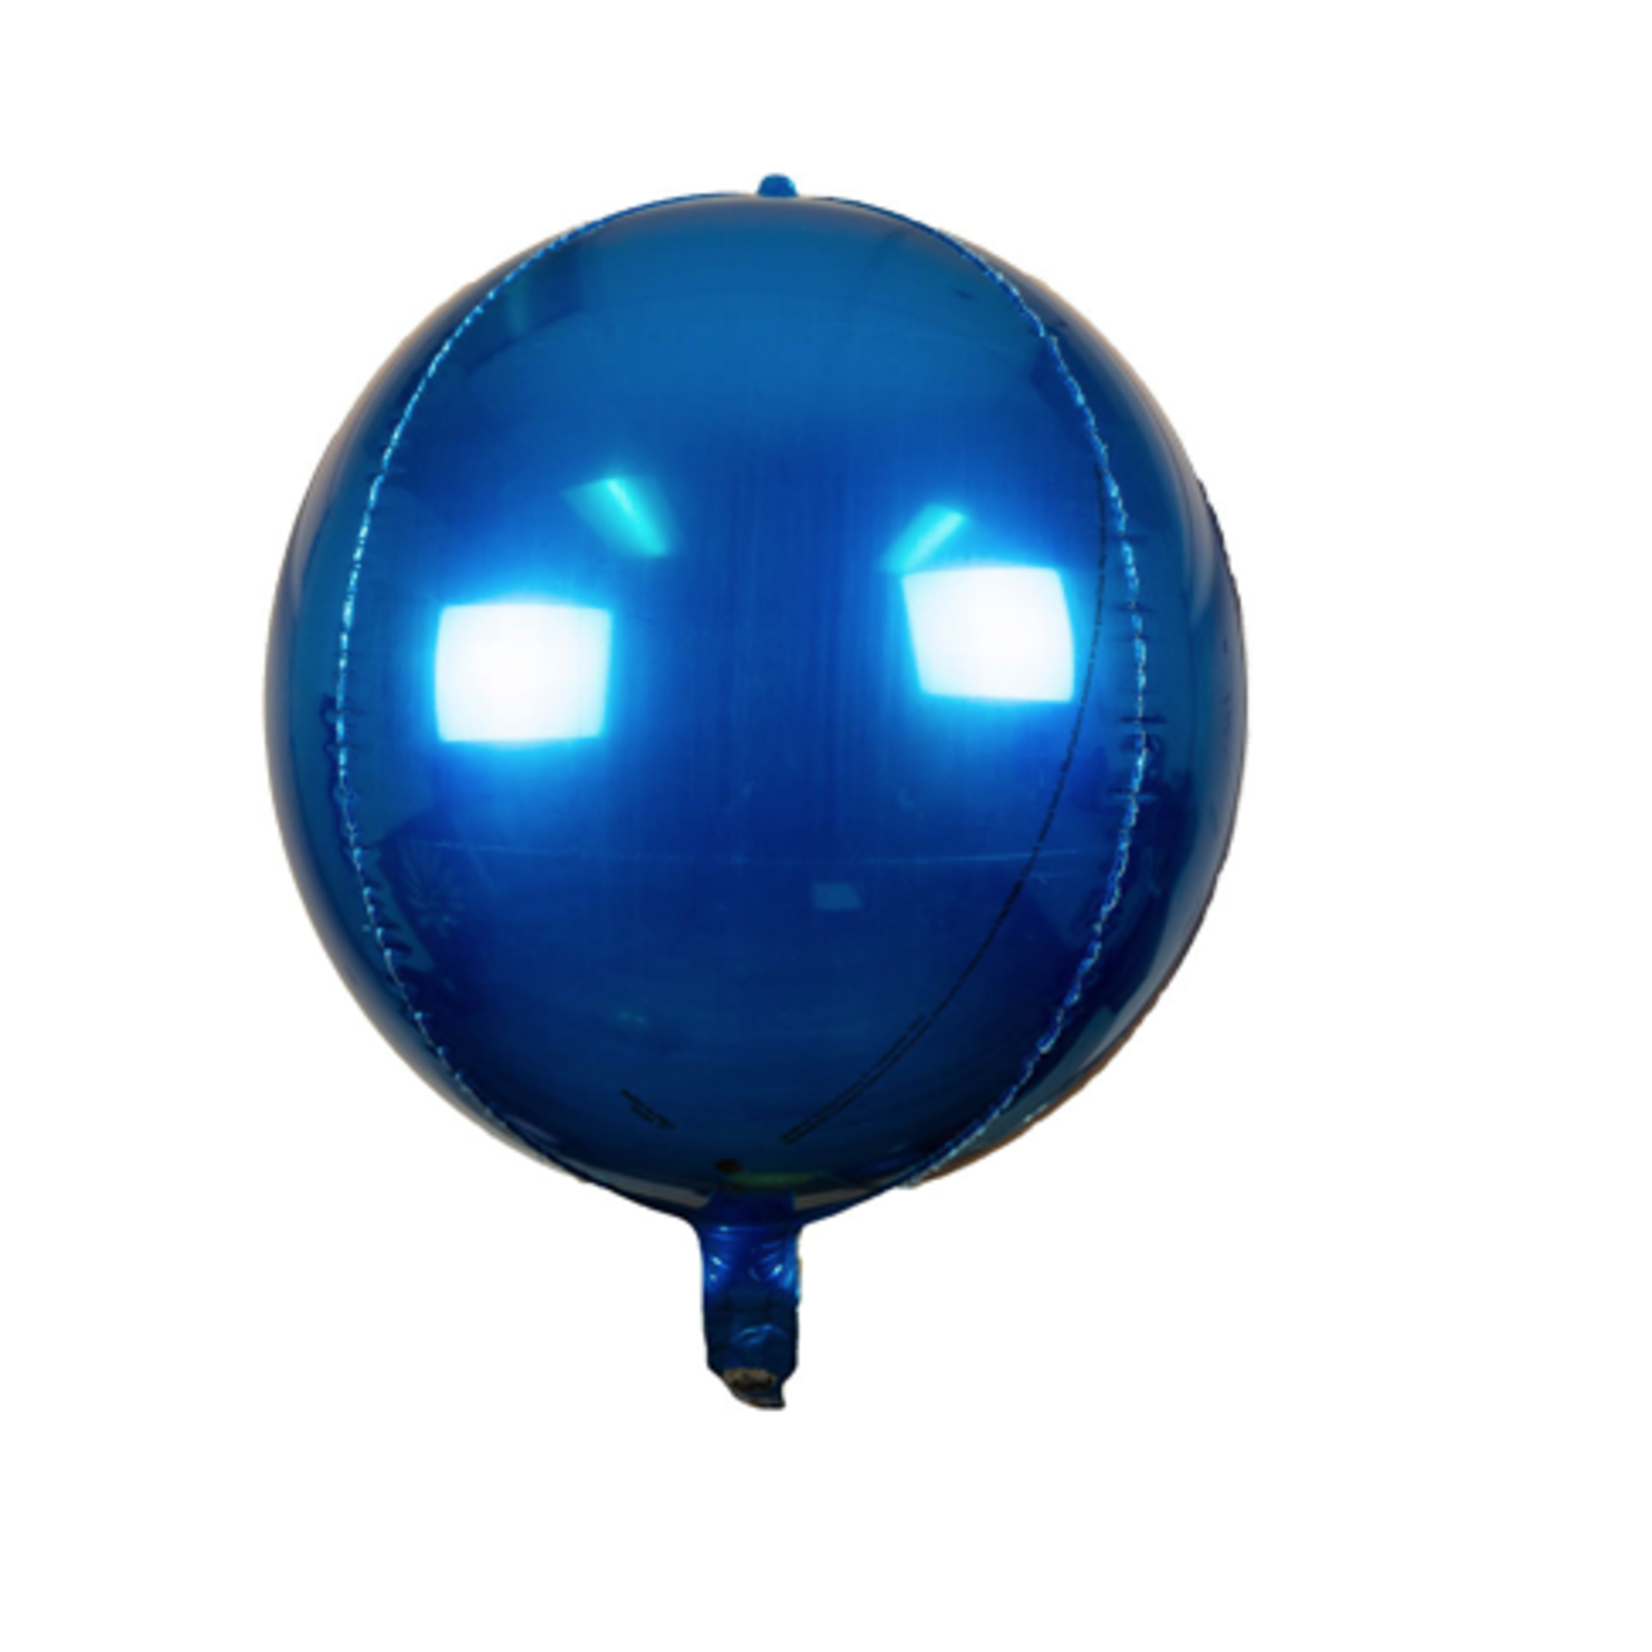 16'' SPHERE FOIL BALLOON- ROYAL BLUE